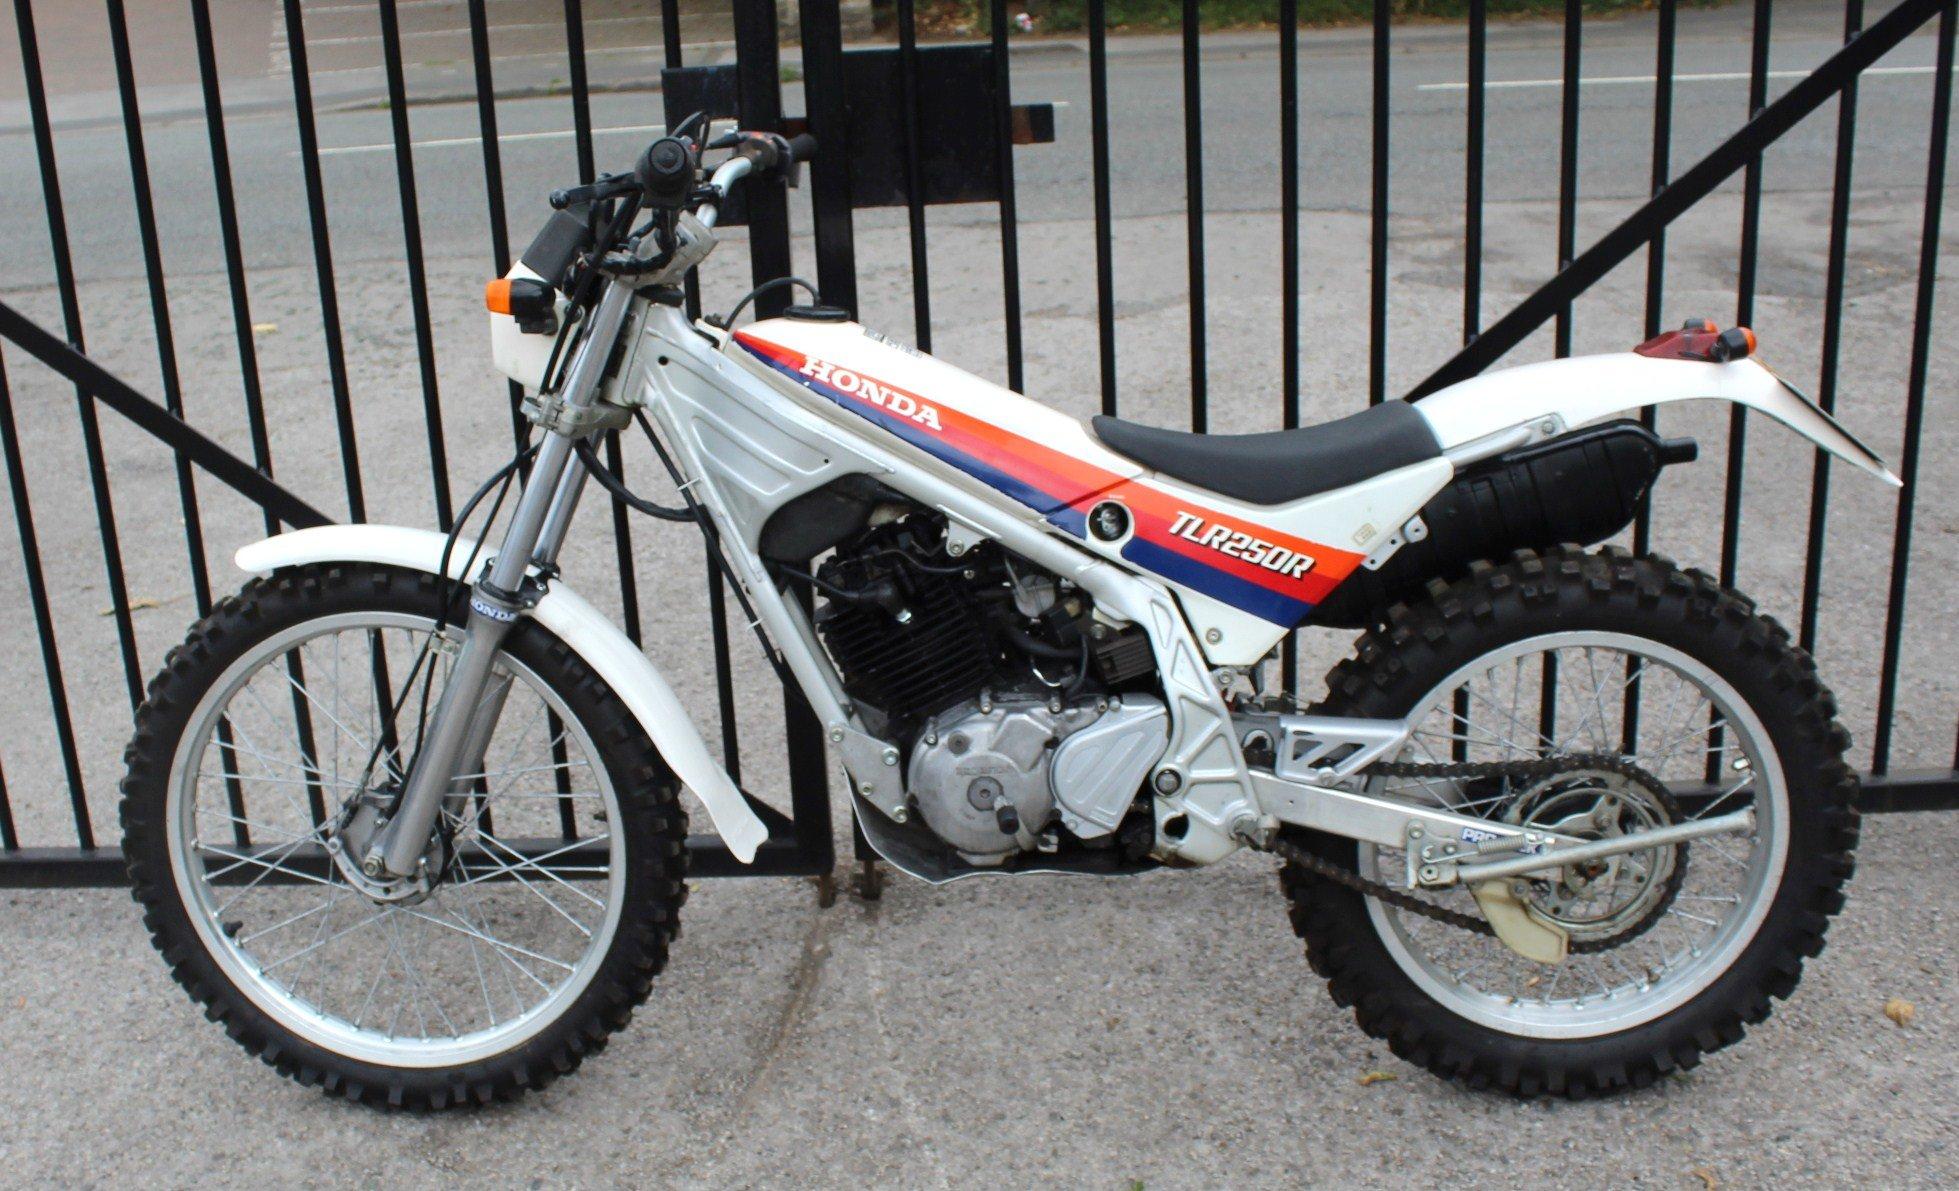 1986 Honda TLR 250 cc Trials Bike Road Registered SOLD (picture 4 of 6)